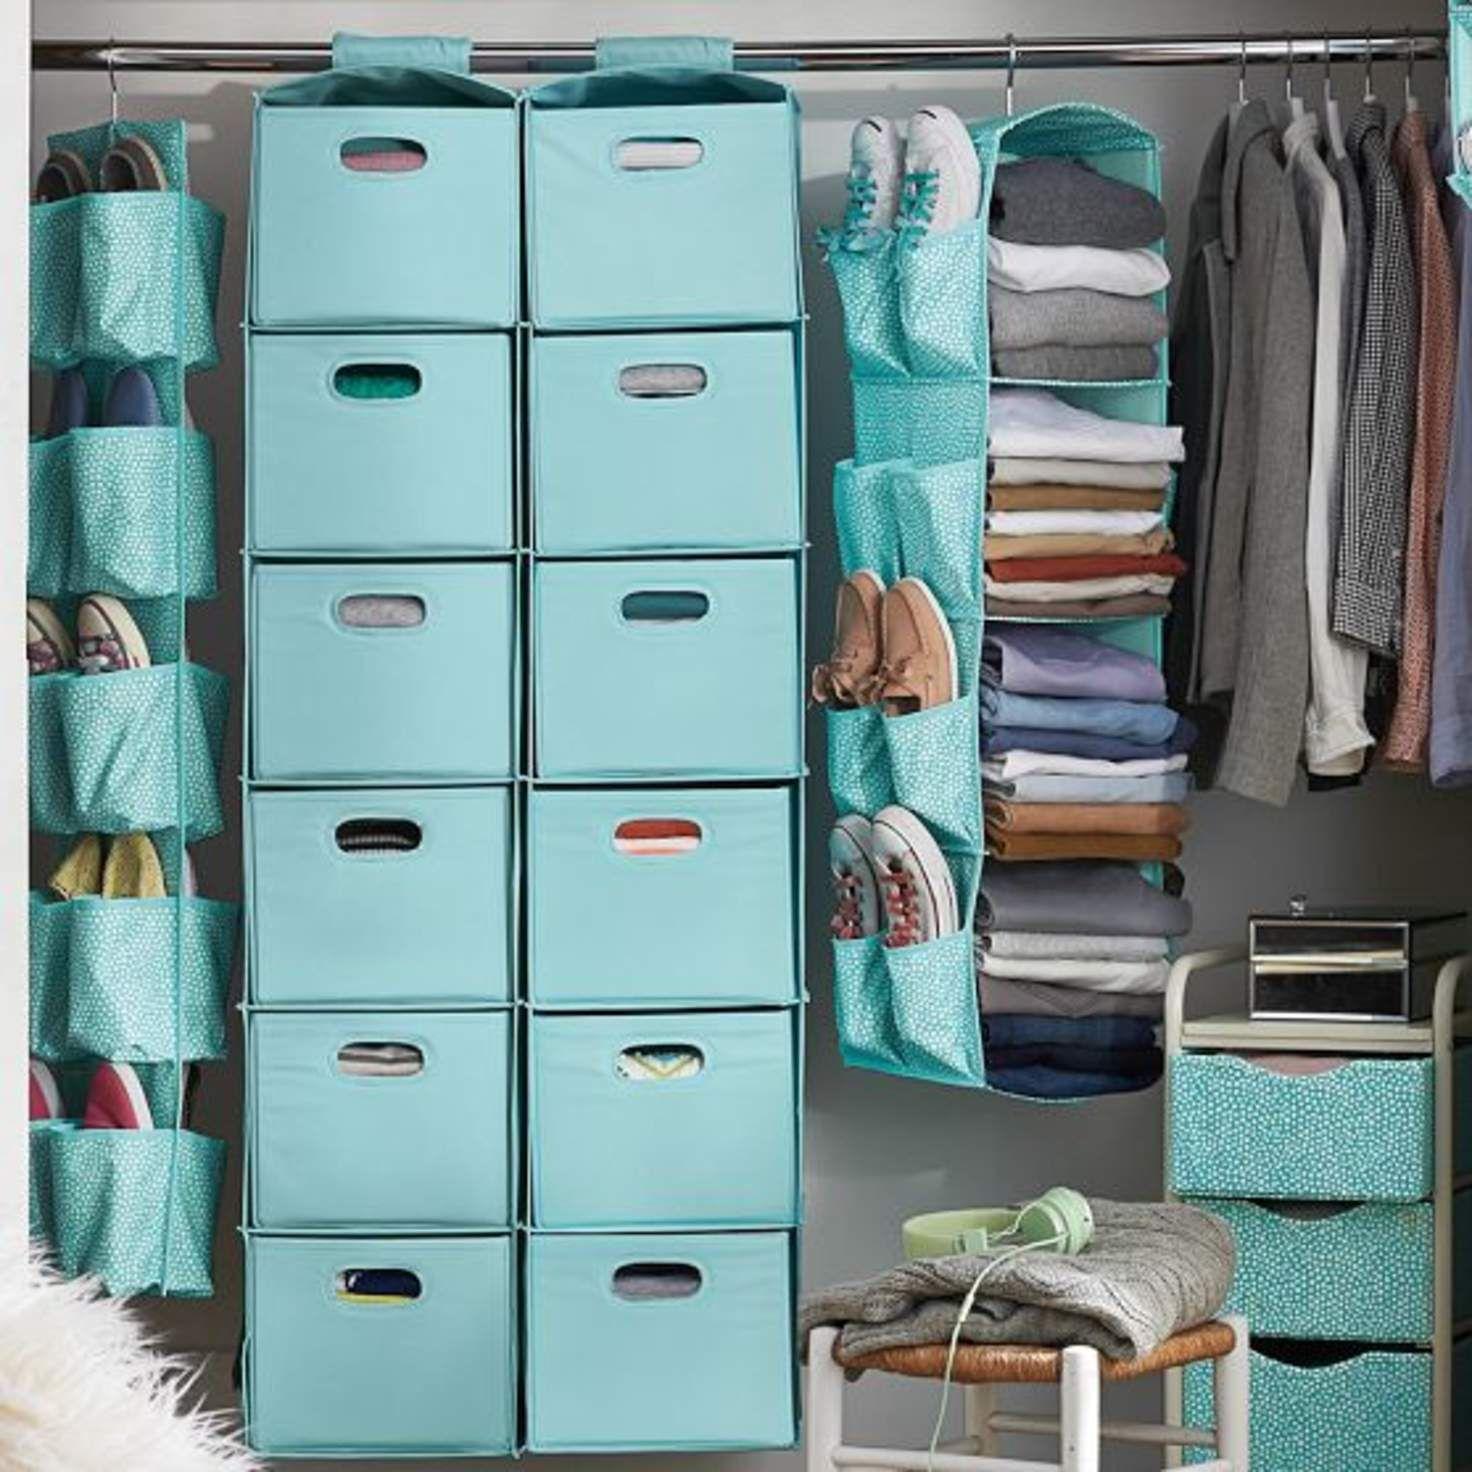 beyond s walmart closet hang mainstays hanging with organizer drawers shelves mesh shelf ikea double bath bed